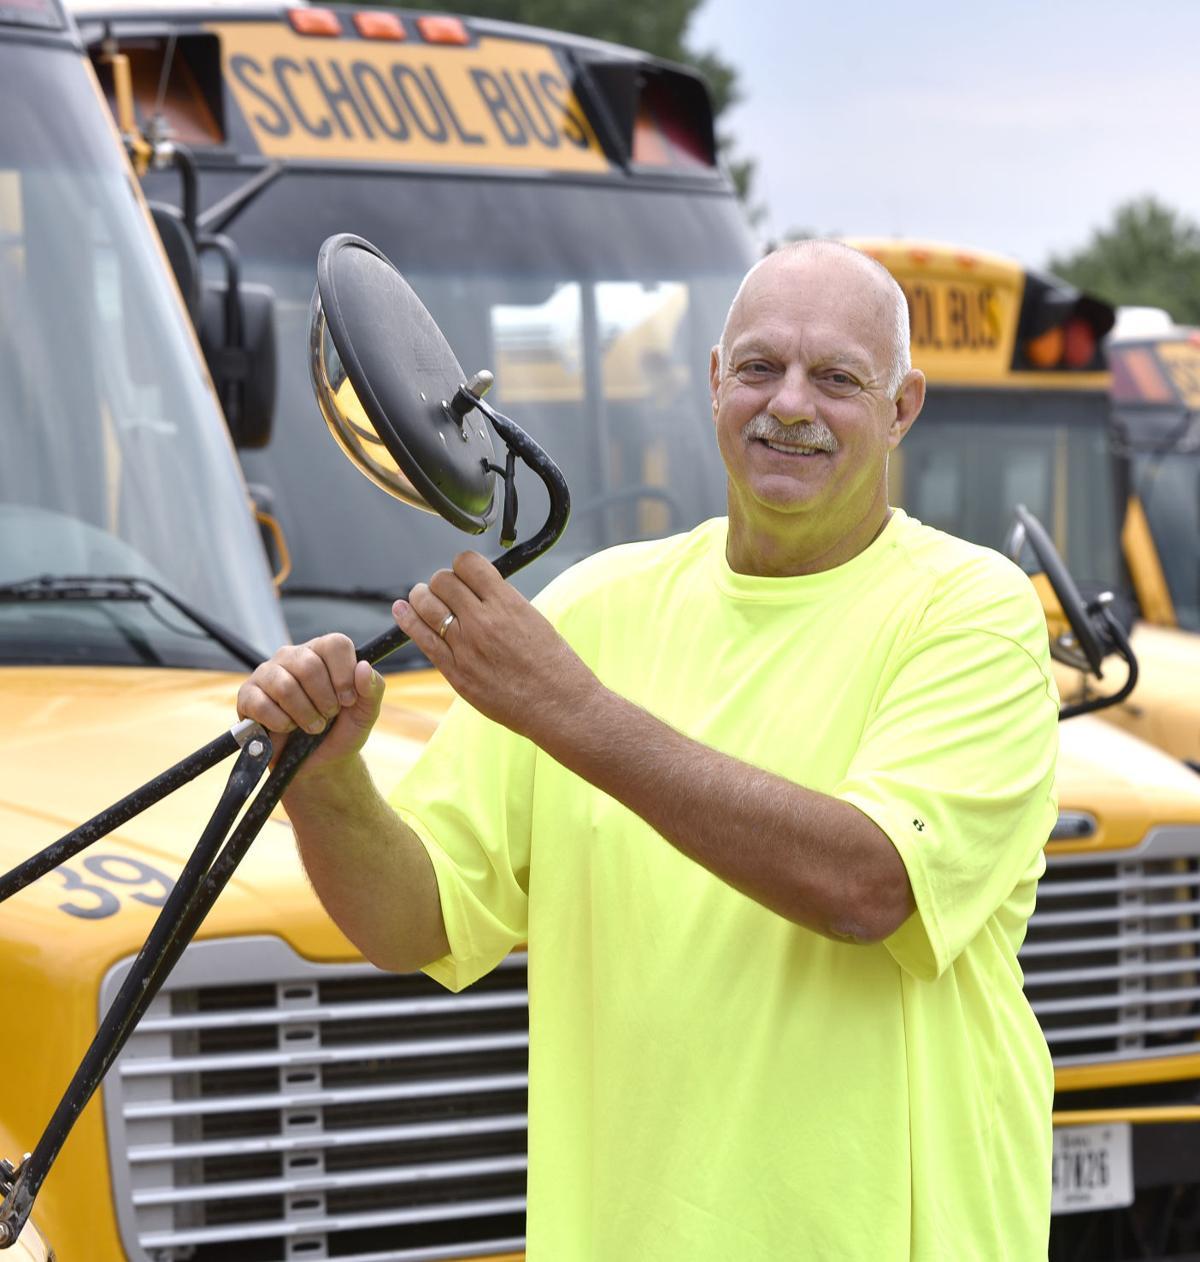 School bus driver George Gengler